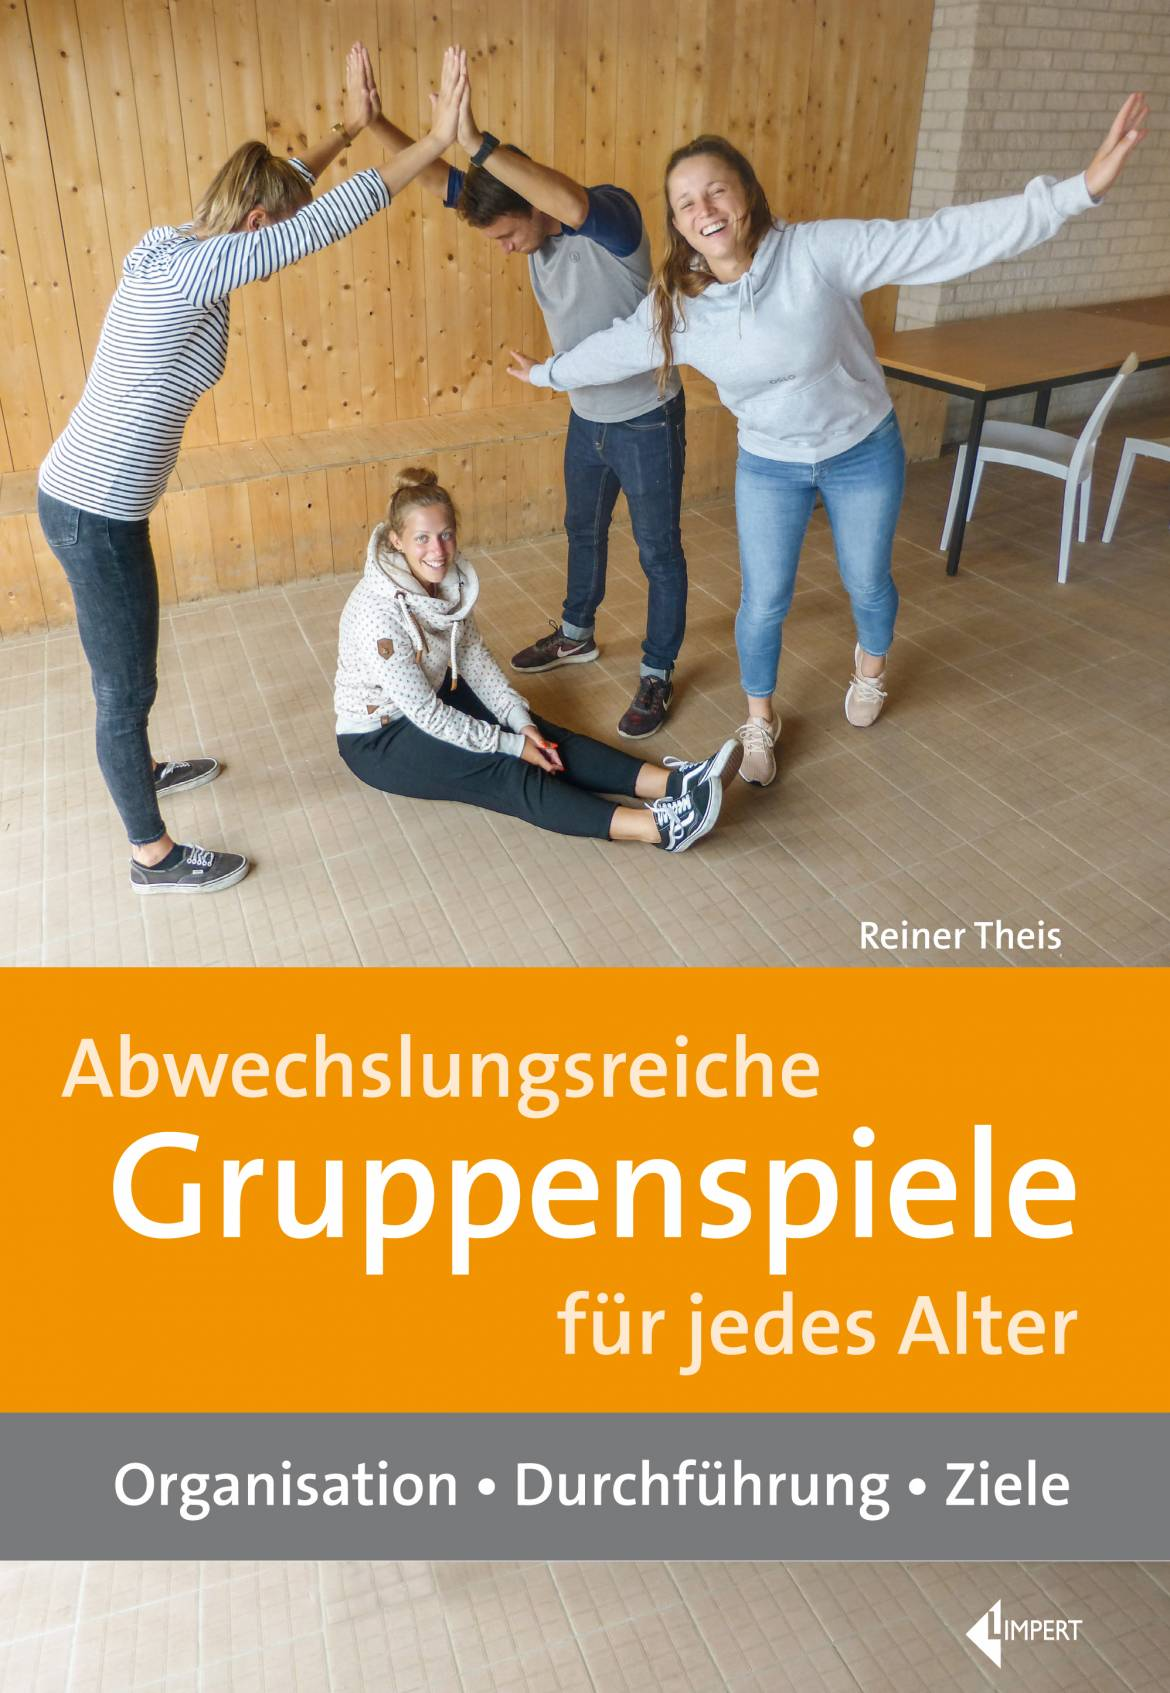 Theis-Gruppenspiele-1.jpg